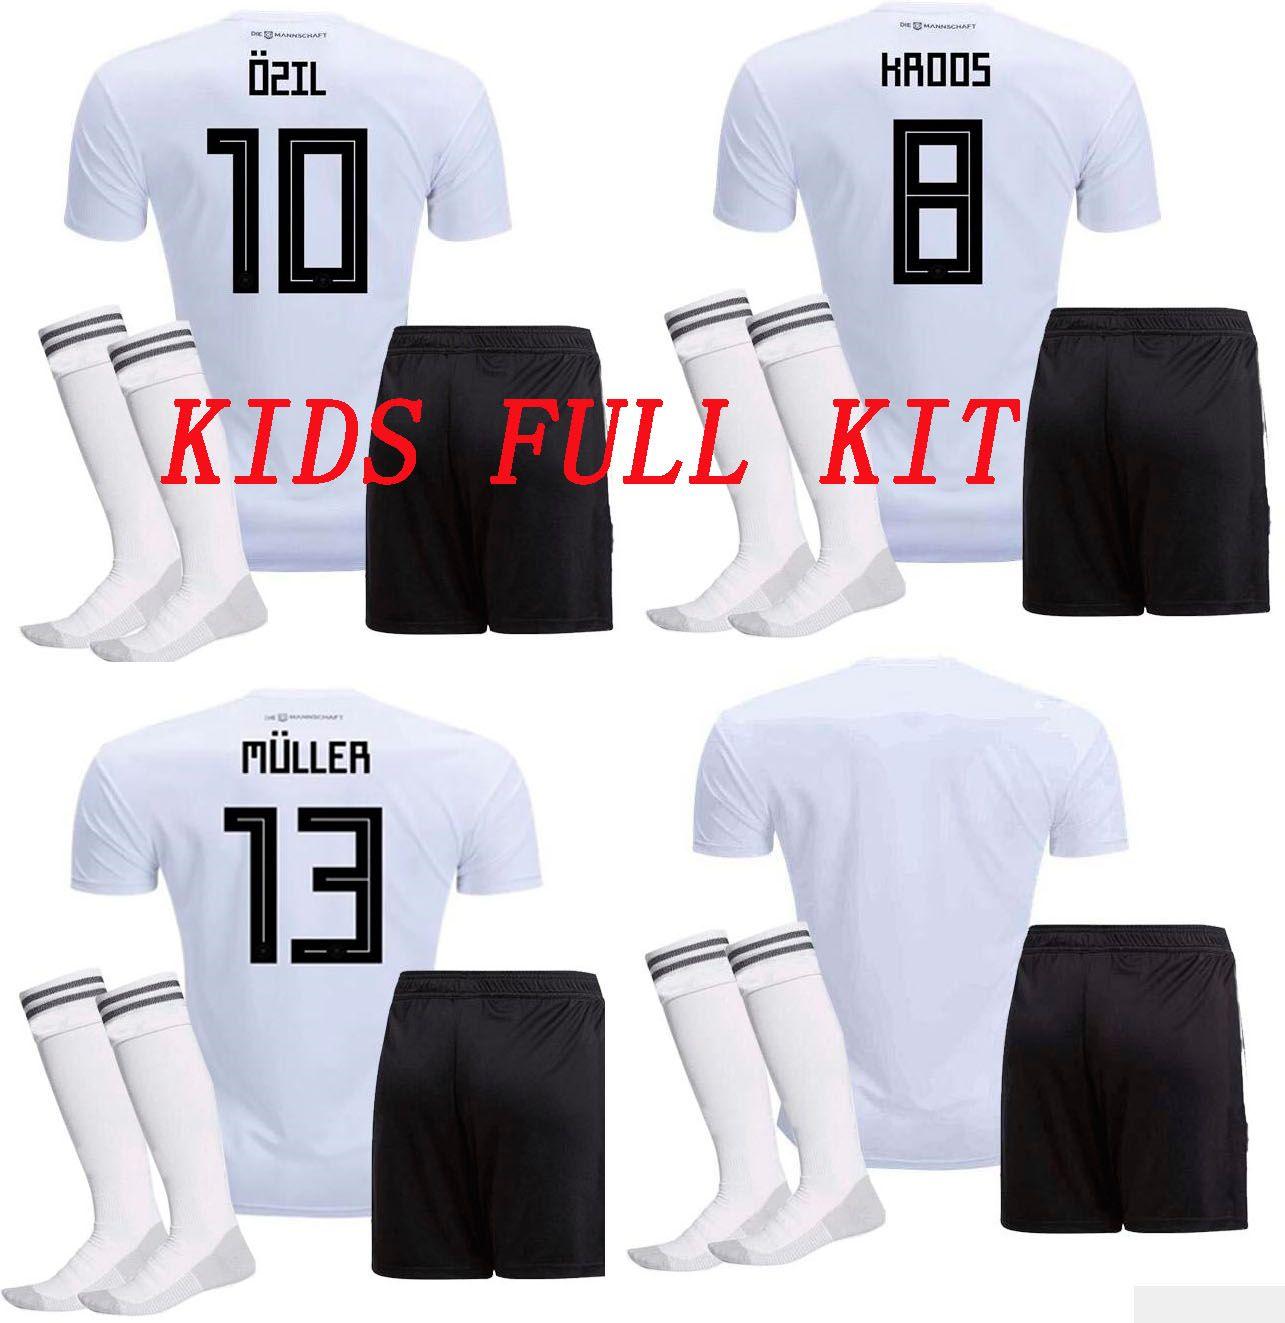 Compre 18 19 Uniformes De Fútbol Para Niños MULLER OZIL GOTZE REUS KROOS  Kits Completos De Fútbol Para Niños Deutschland 2018 Copa Del Mundo De  Fútbol Para ... 66c0b11251939